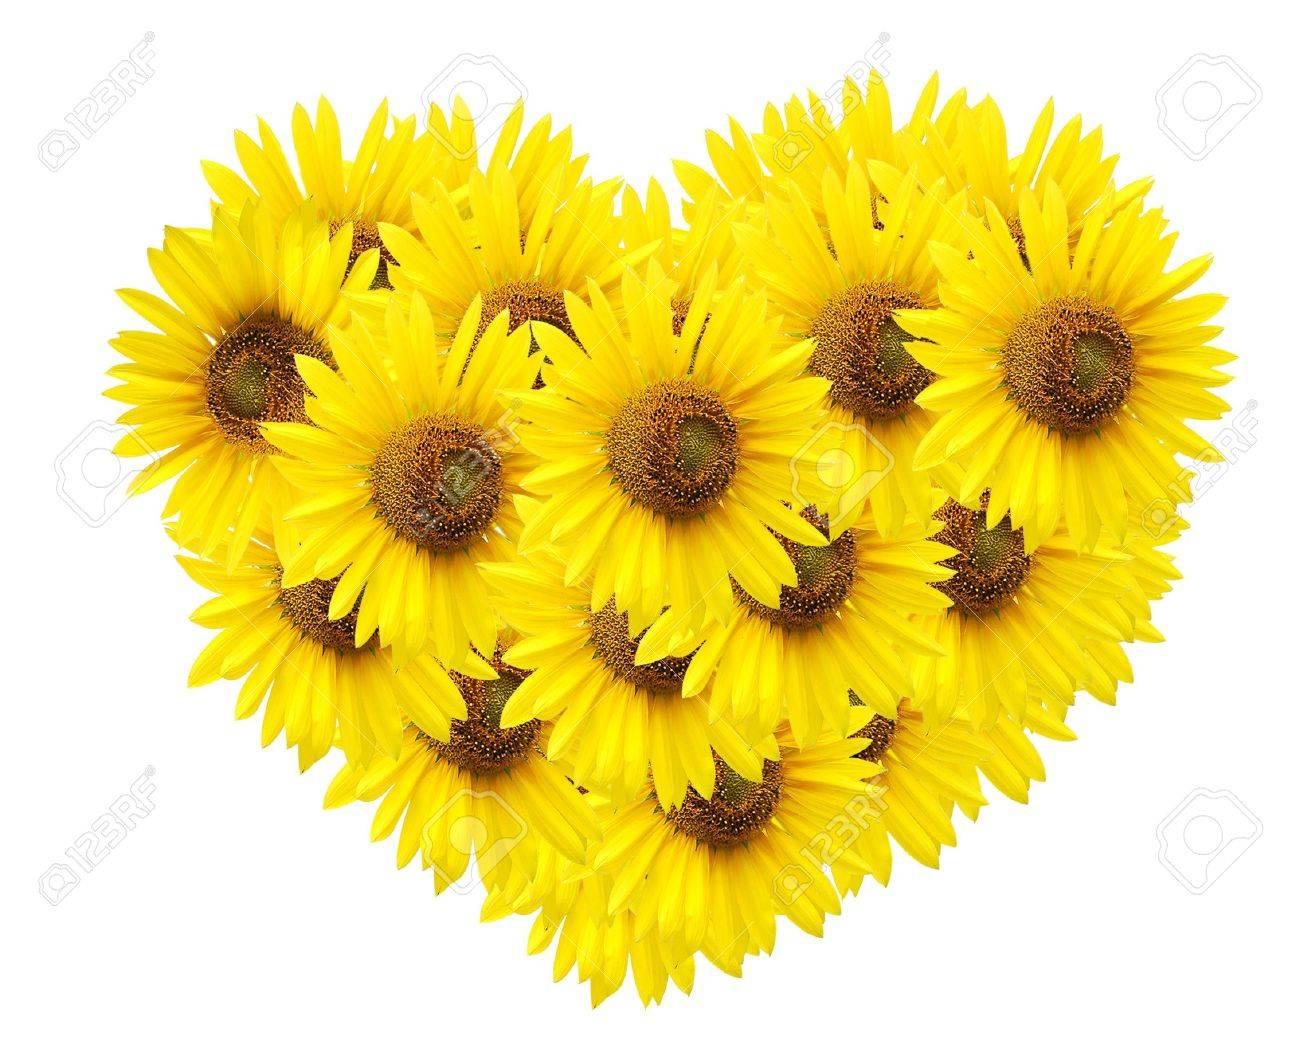 design of sunflower isolated on white. - 9842363